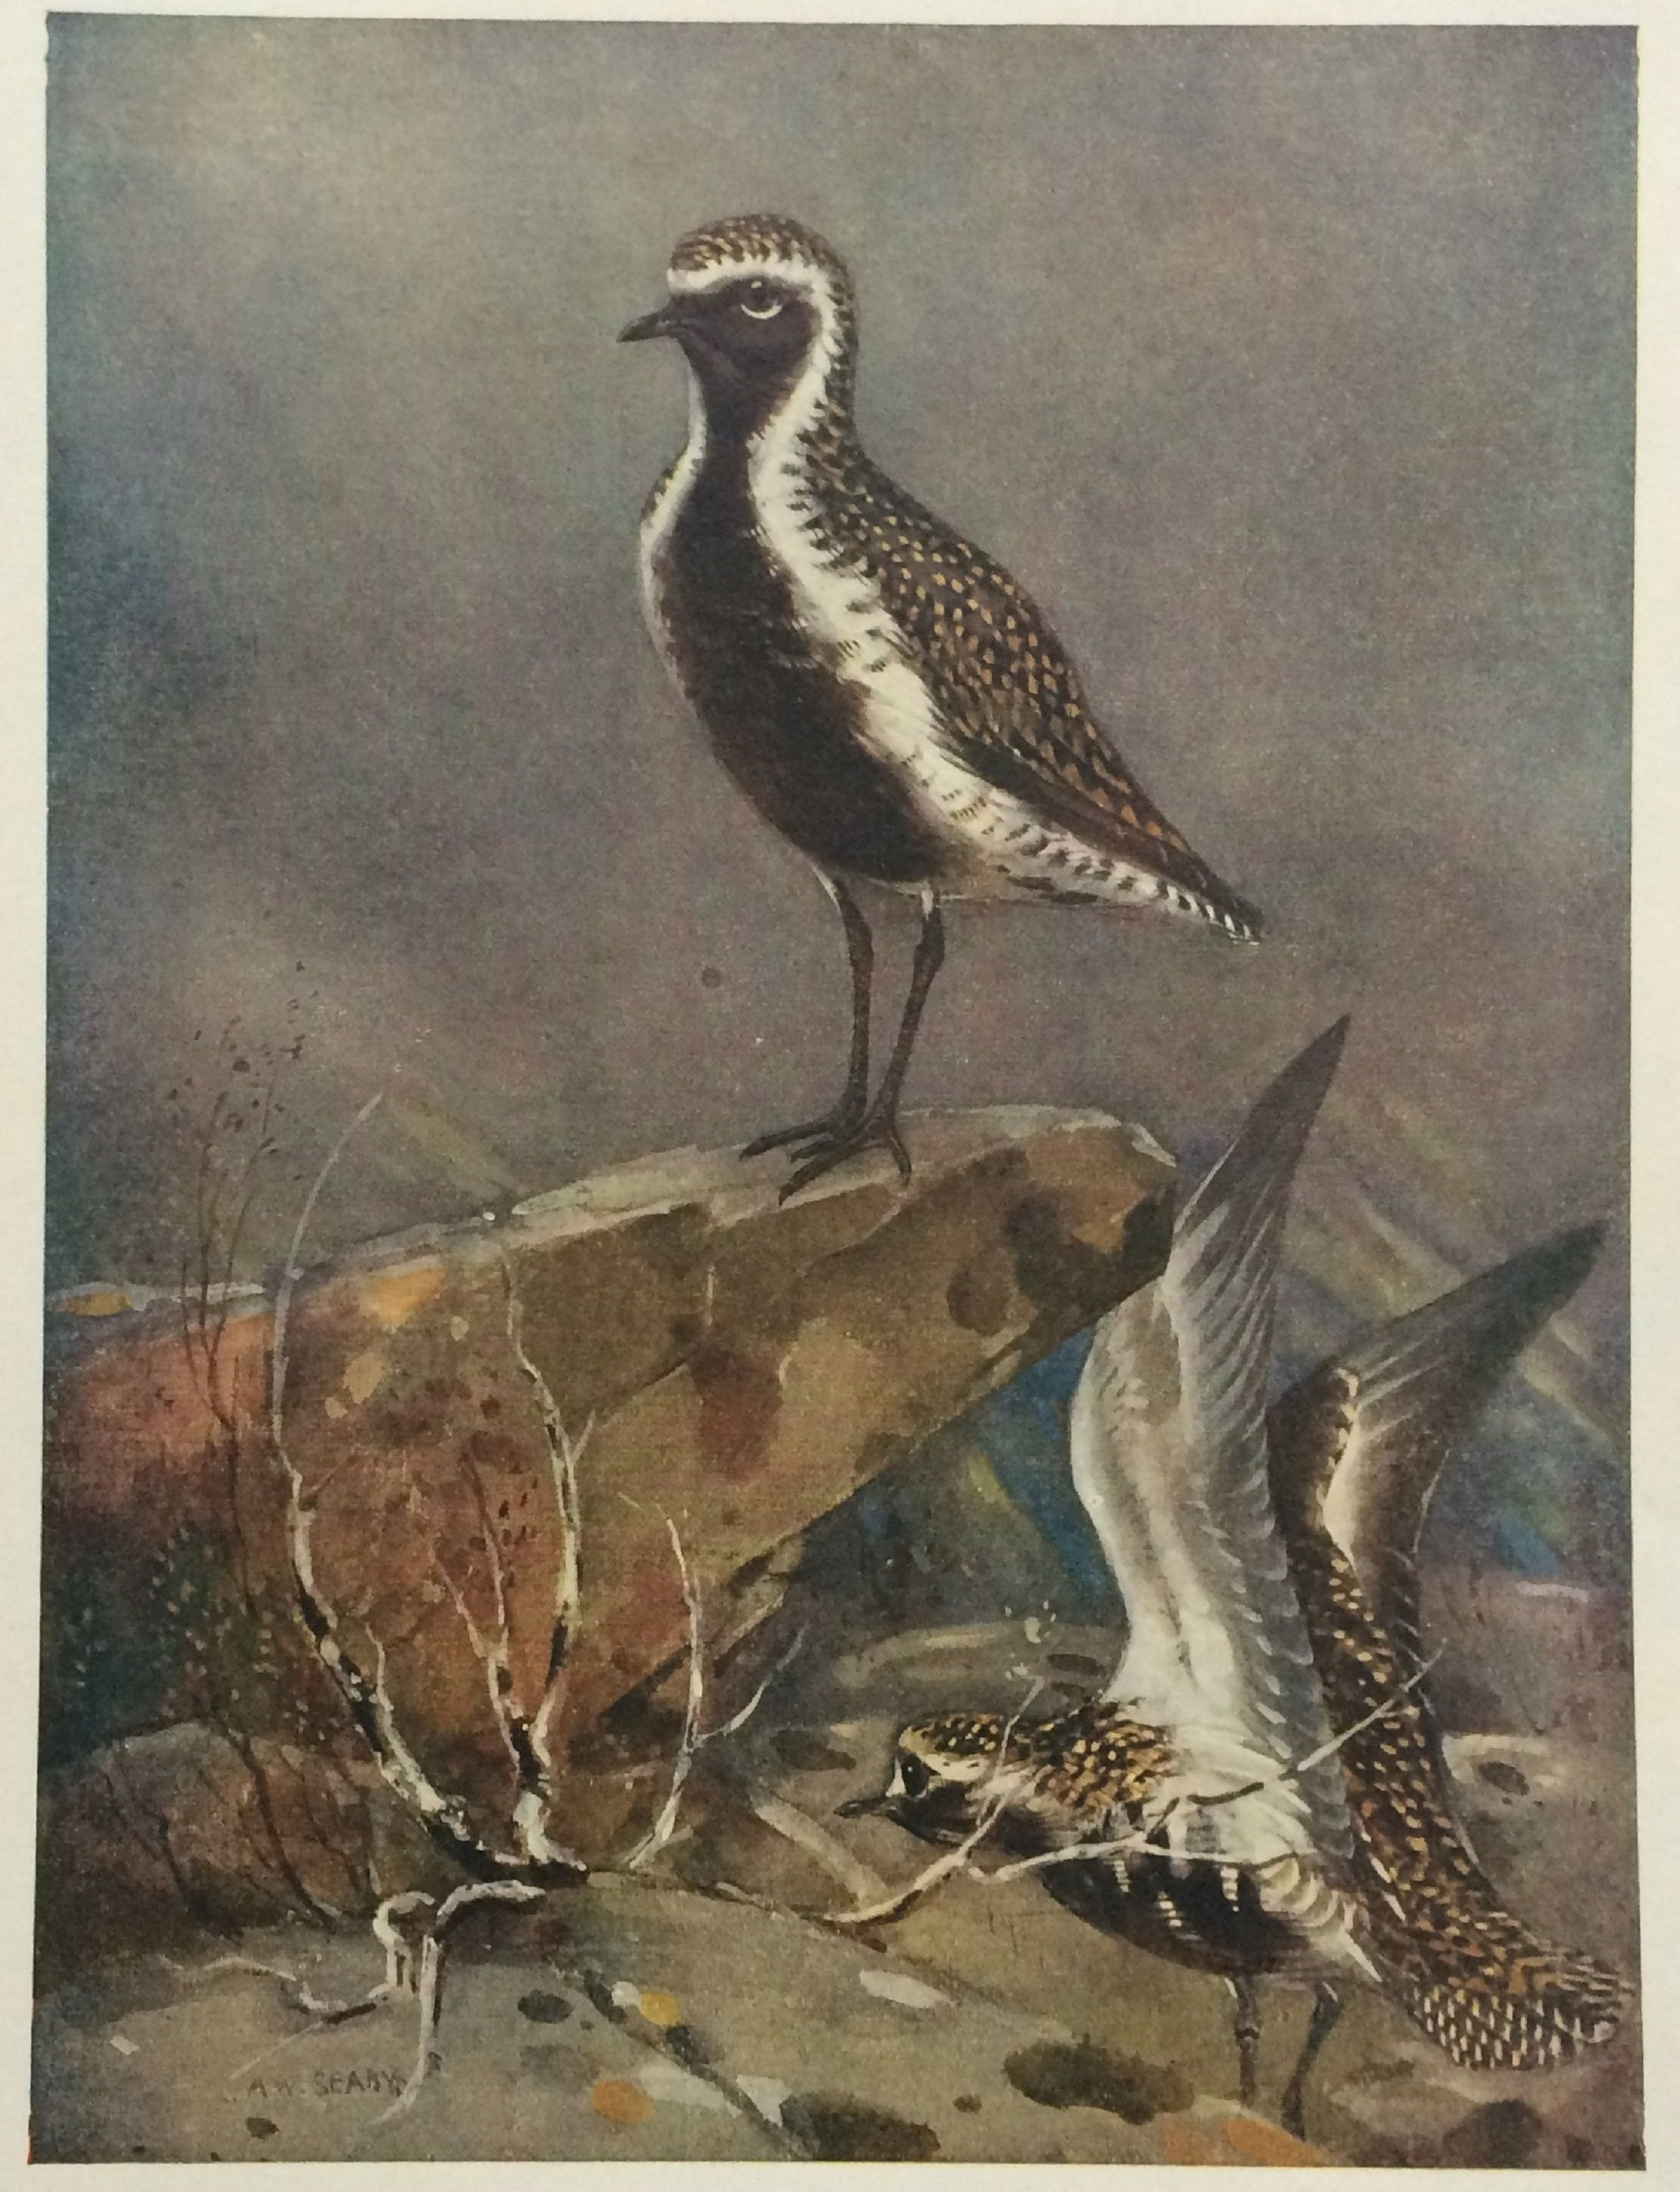 Wildlife Art for Gifts Birds in Art ~ Golden Plover